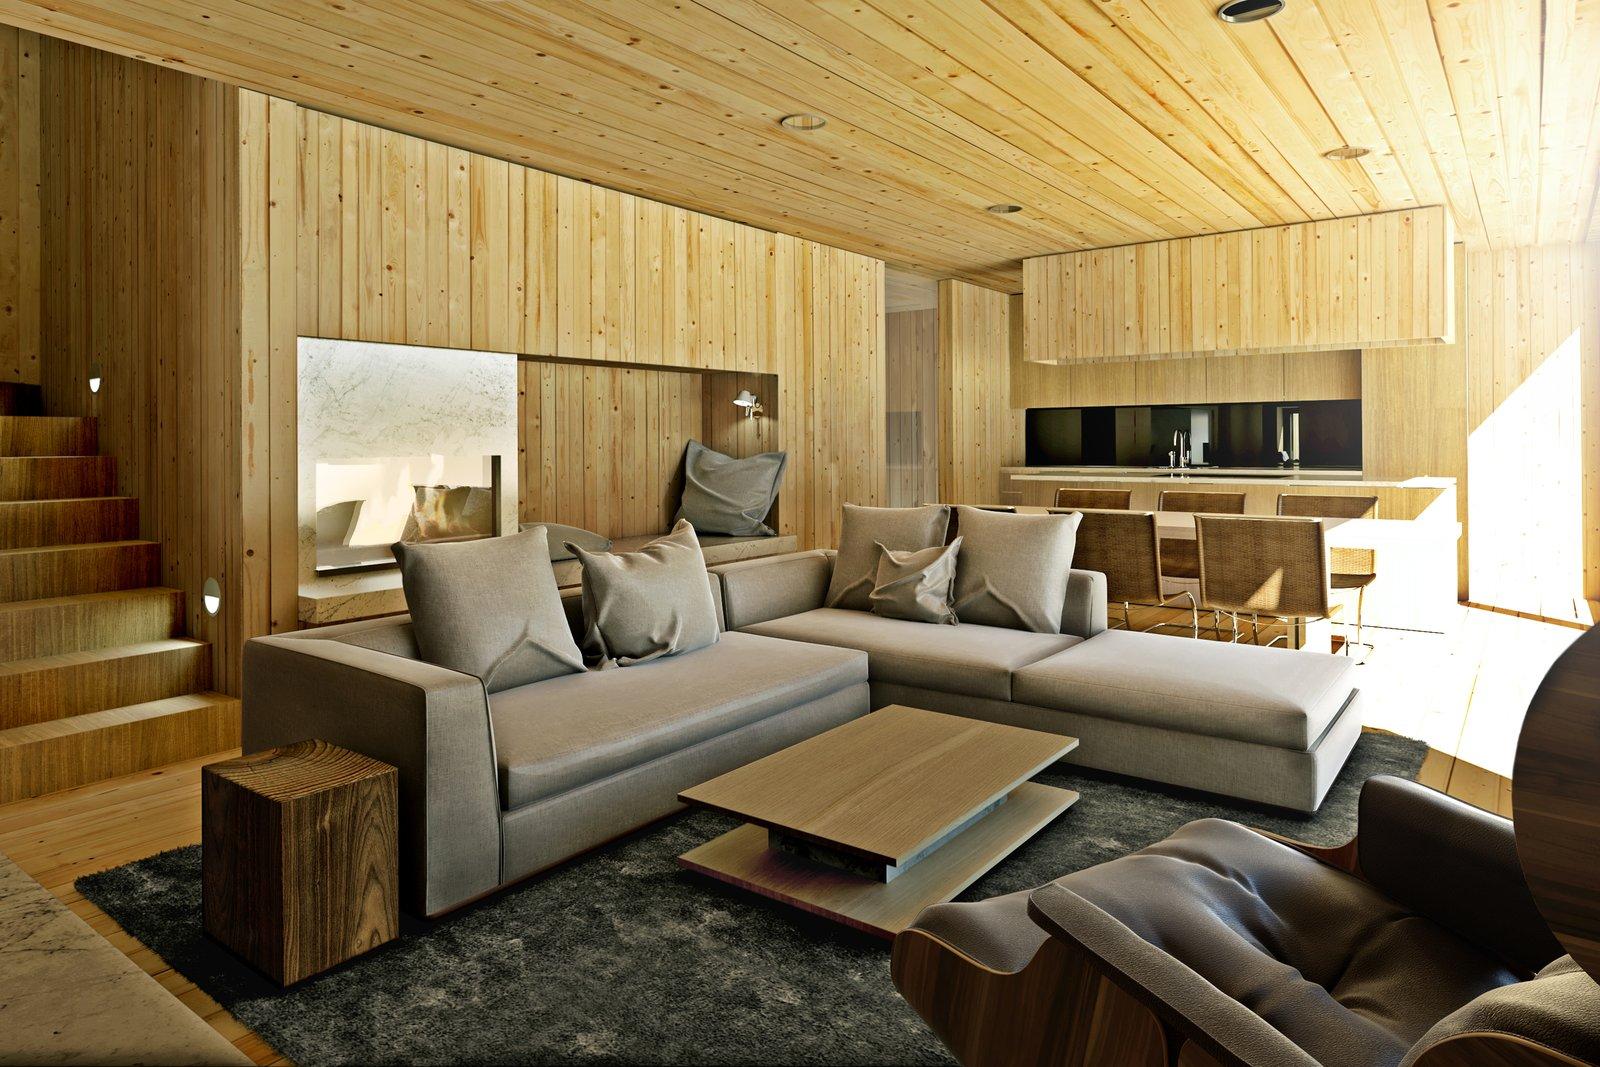 Mountain hut living room